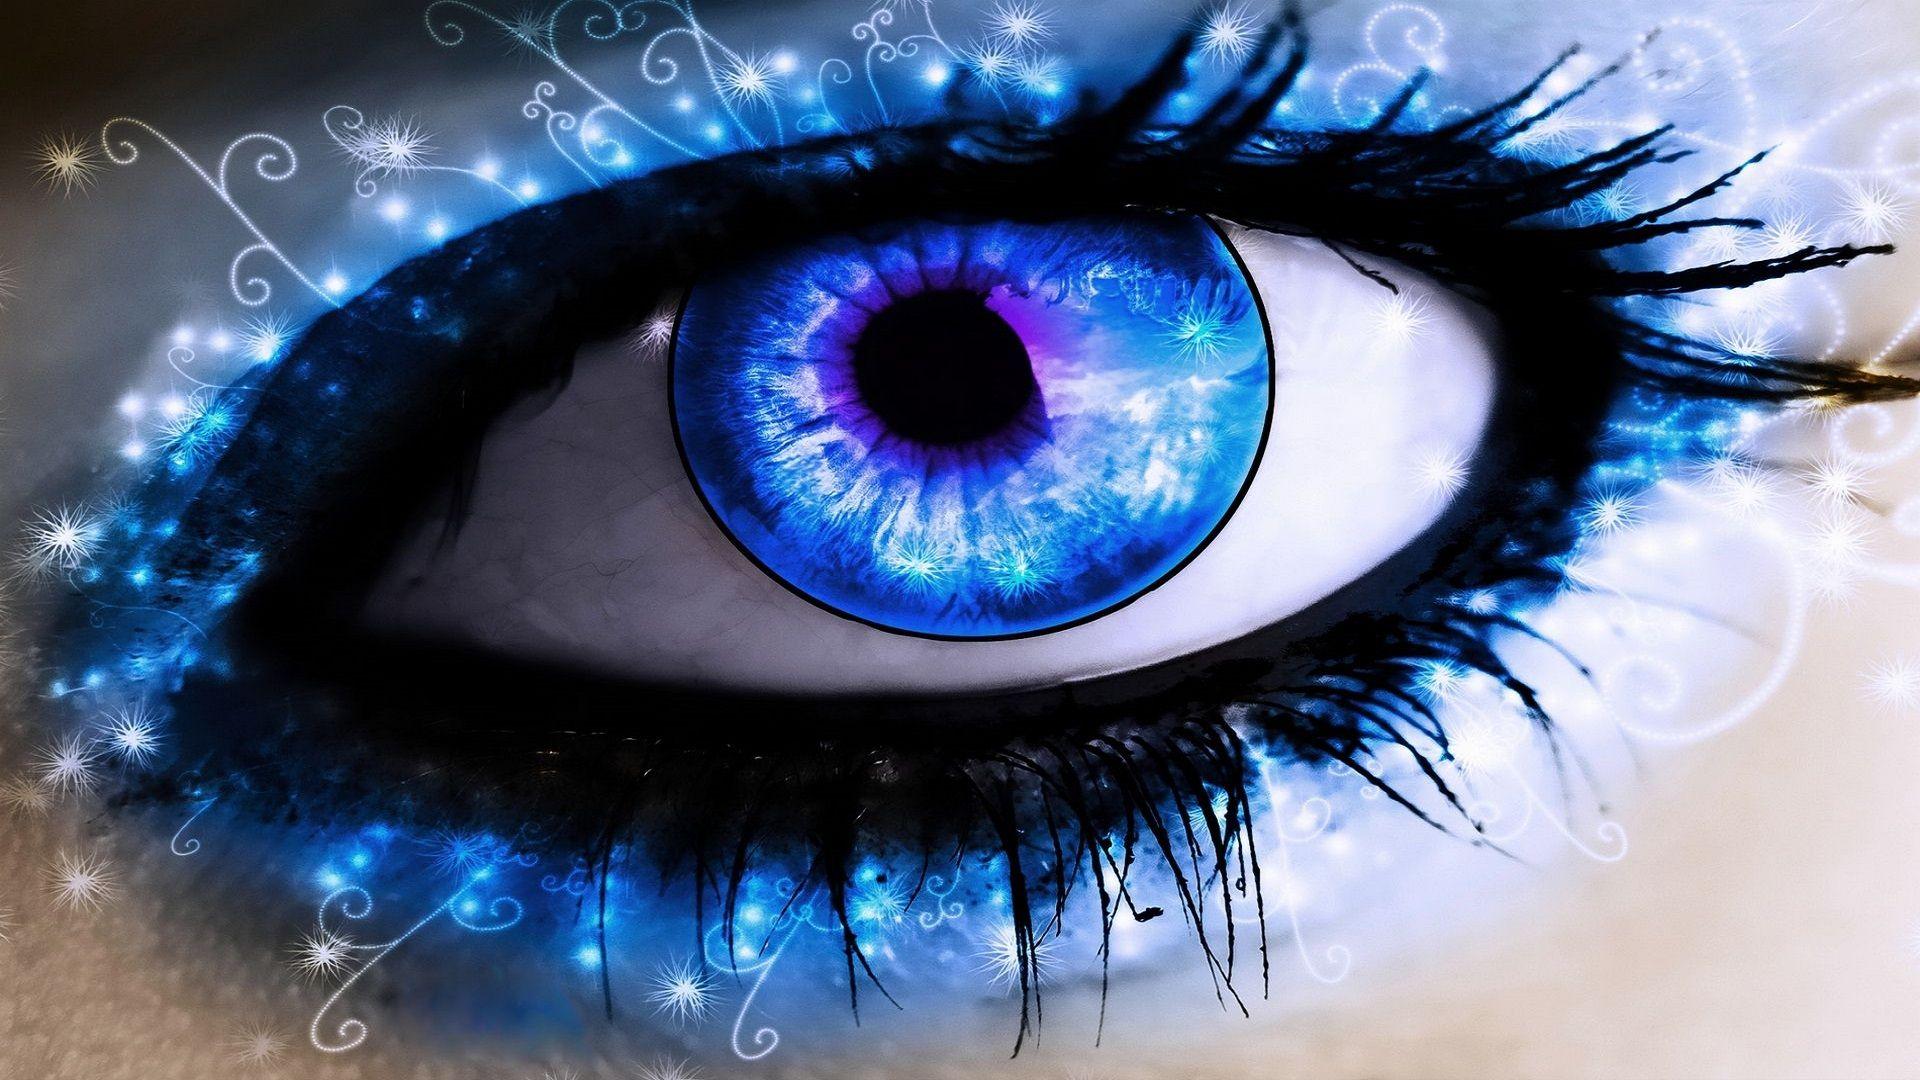 Eyes Wallpaper  Augen, Vampir augen, Blaue augen